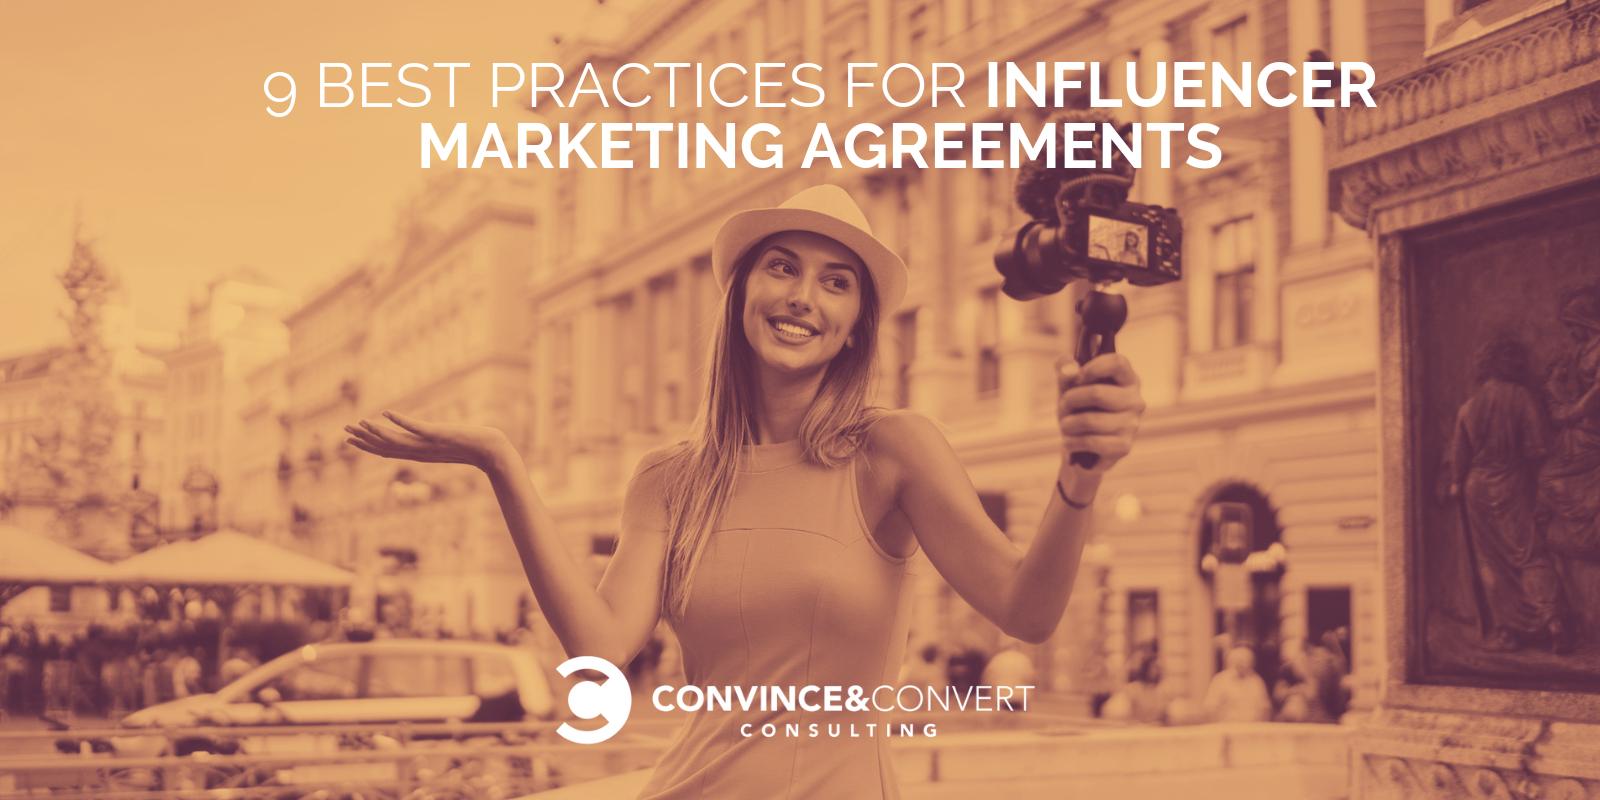 influencer marketing agreements